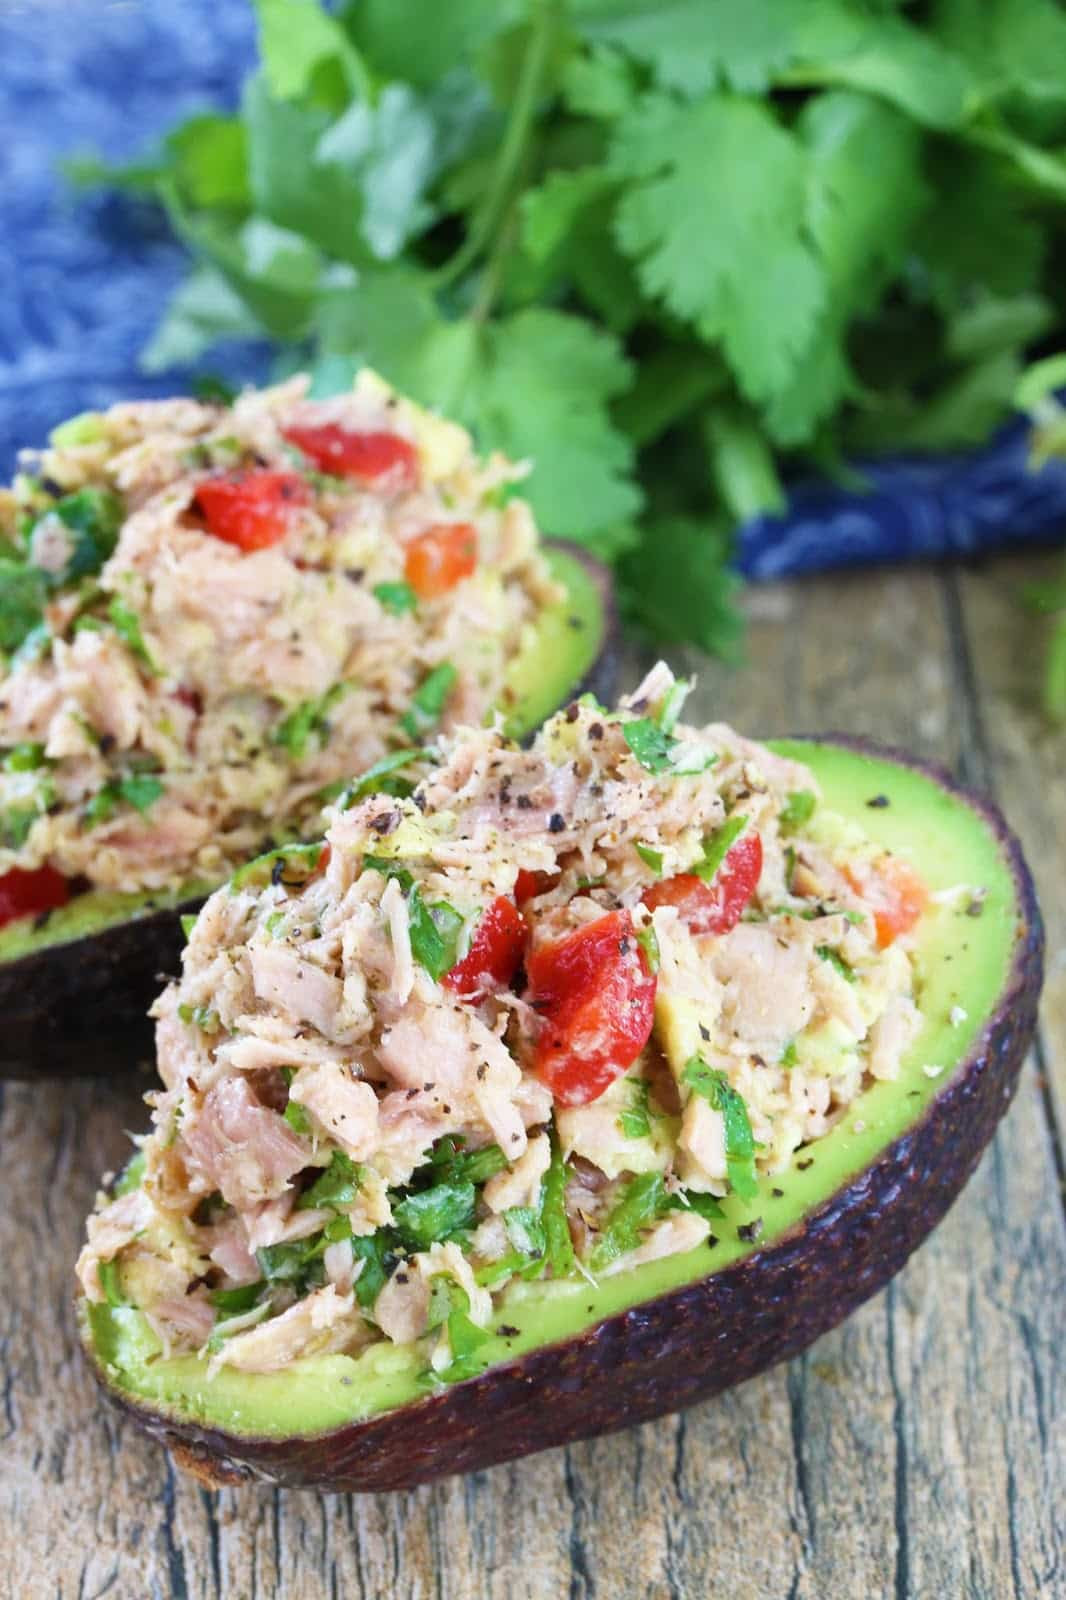 Healthy Avocado Recipes  Healthy Thai Tuna Stuffed Avocado